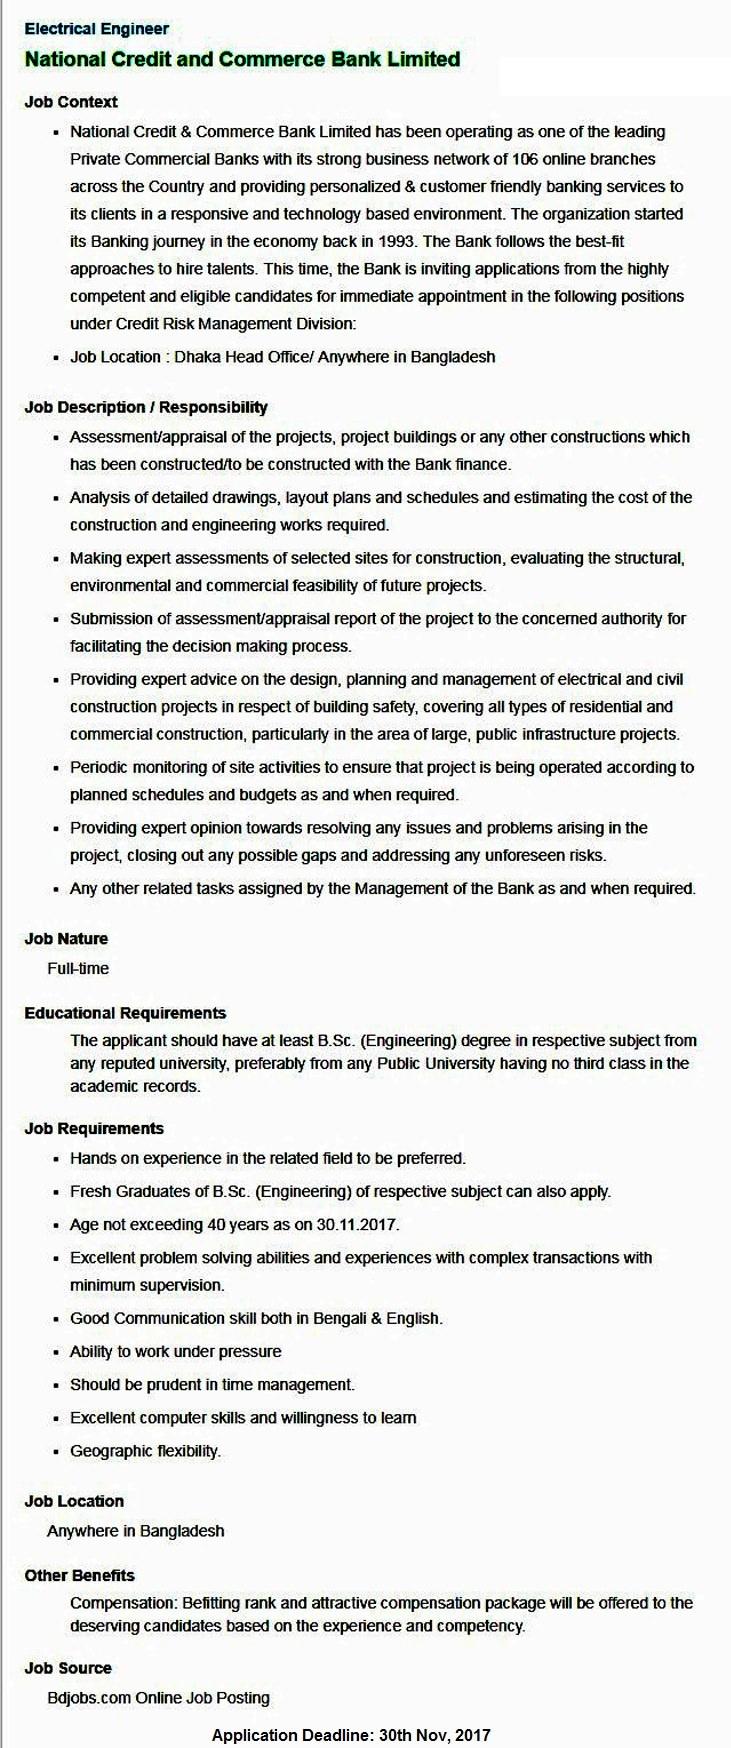 NCC Bank Limited Job Circular 2017